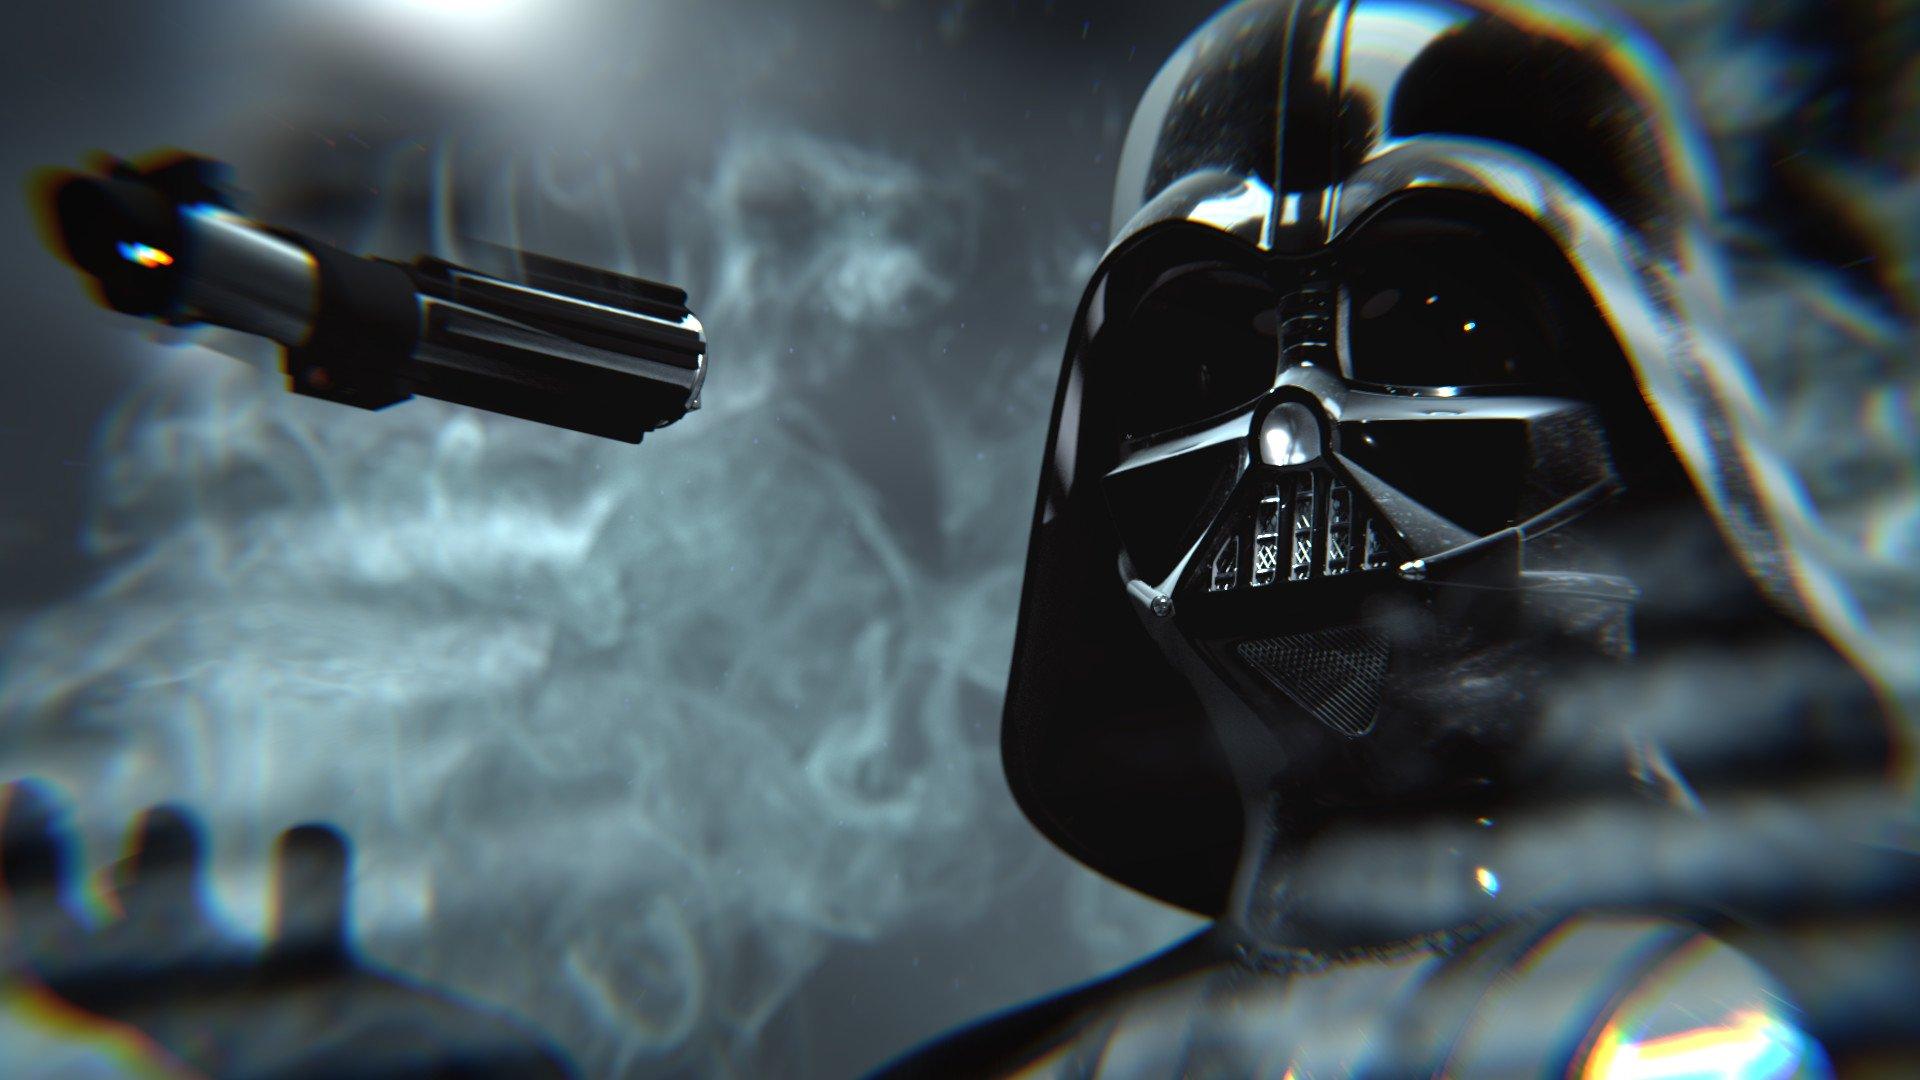 Darth Vader HD Wallpaper  Background Image  1920x1080  ID